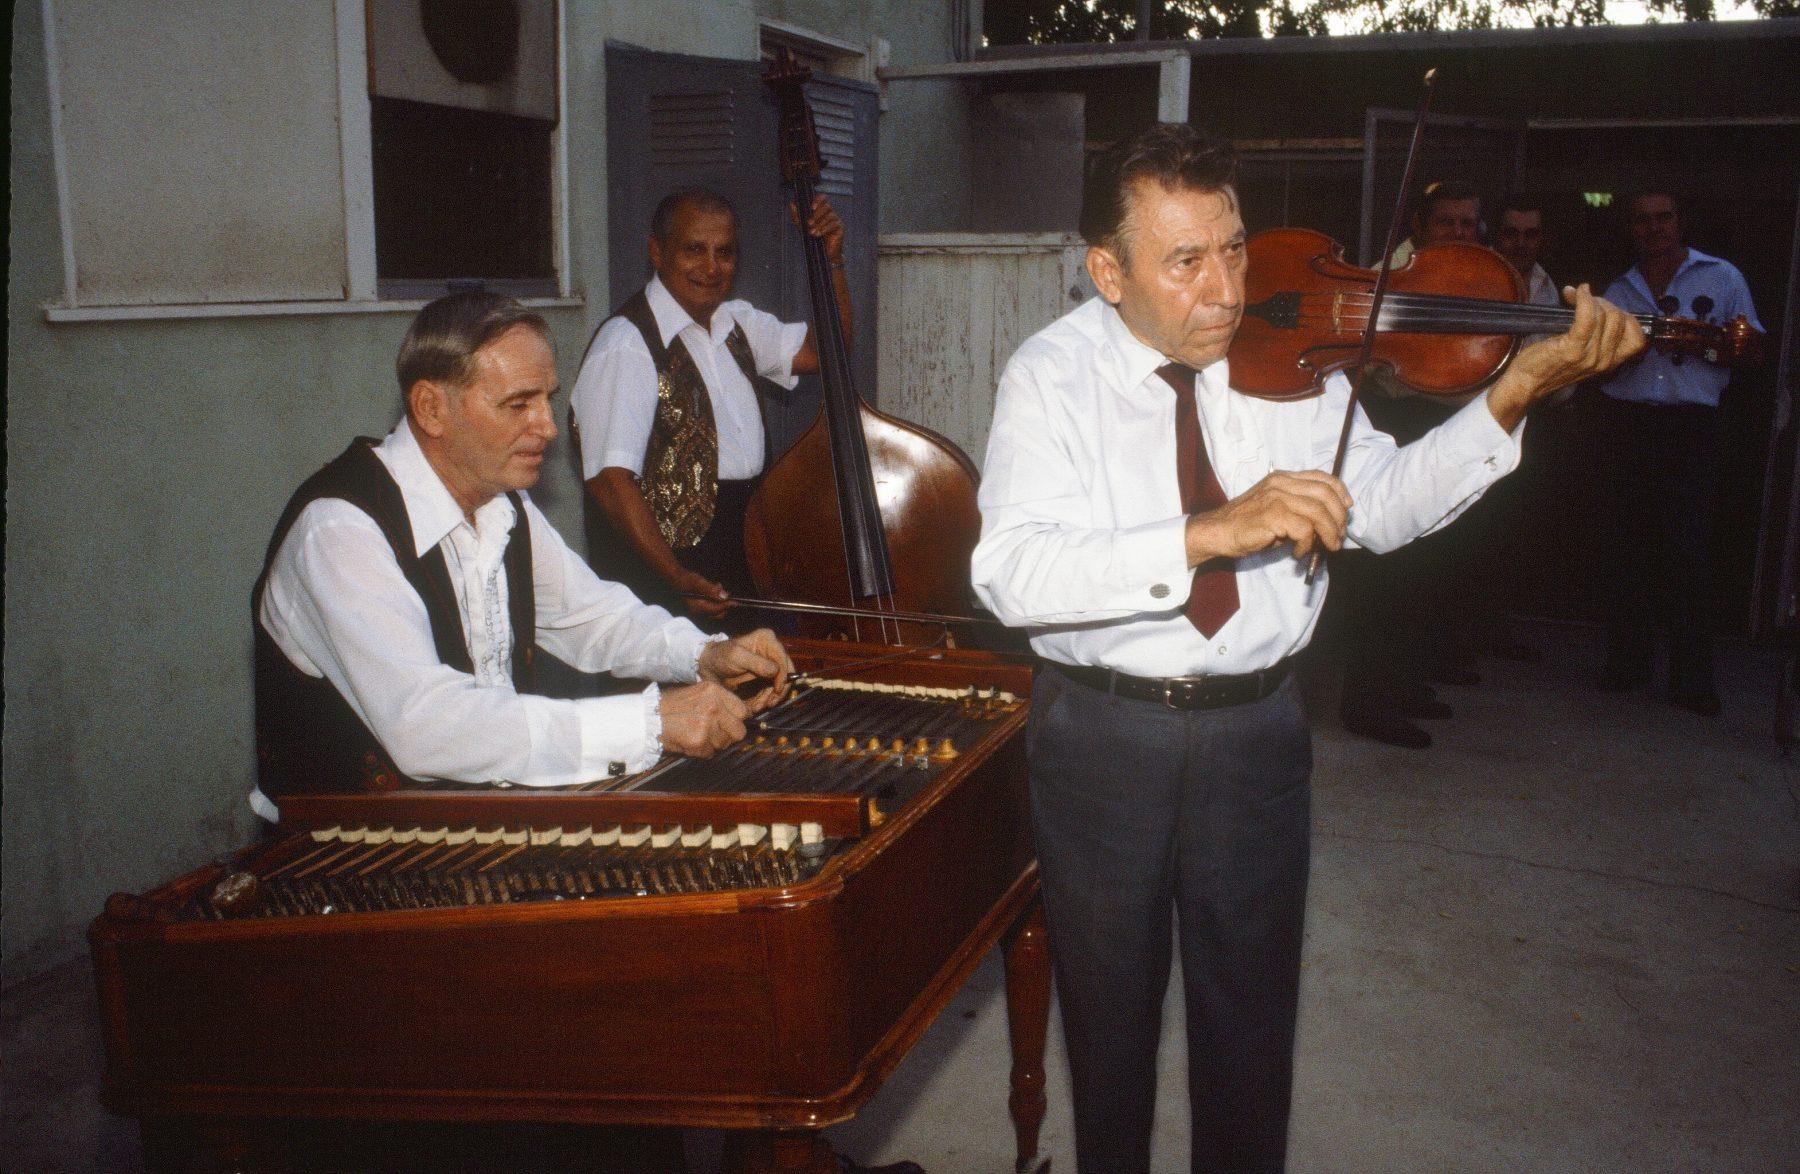 Al Vilagi playing cimbalom with band